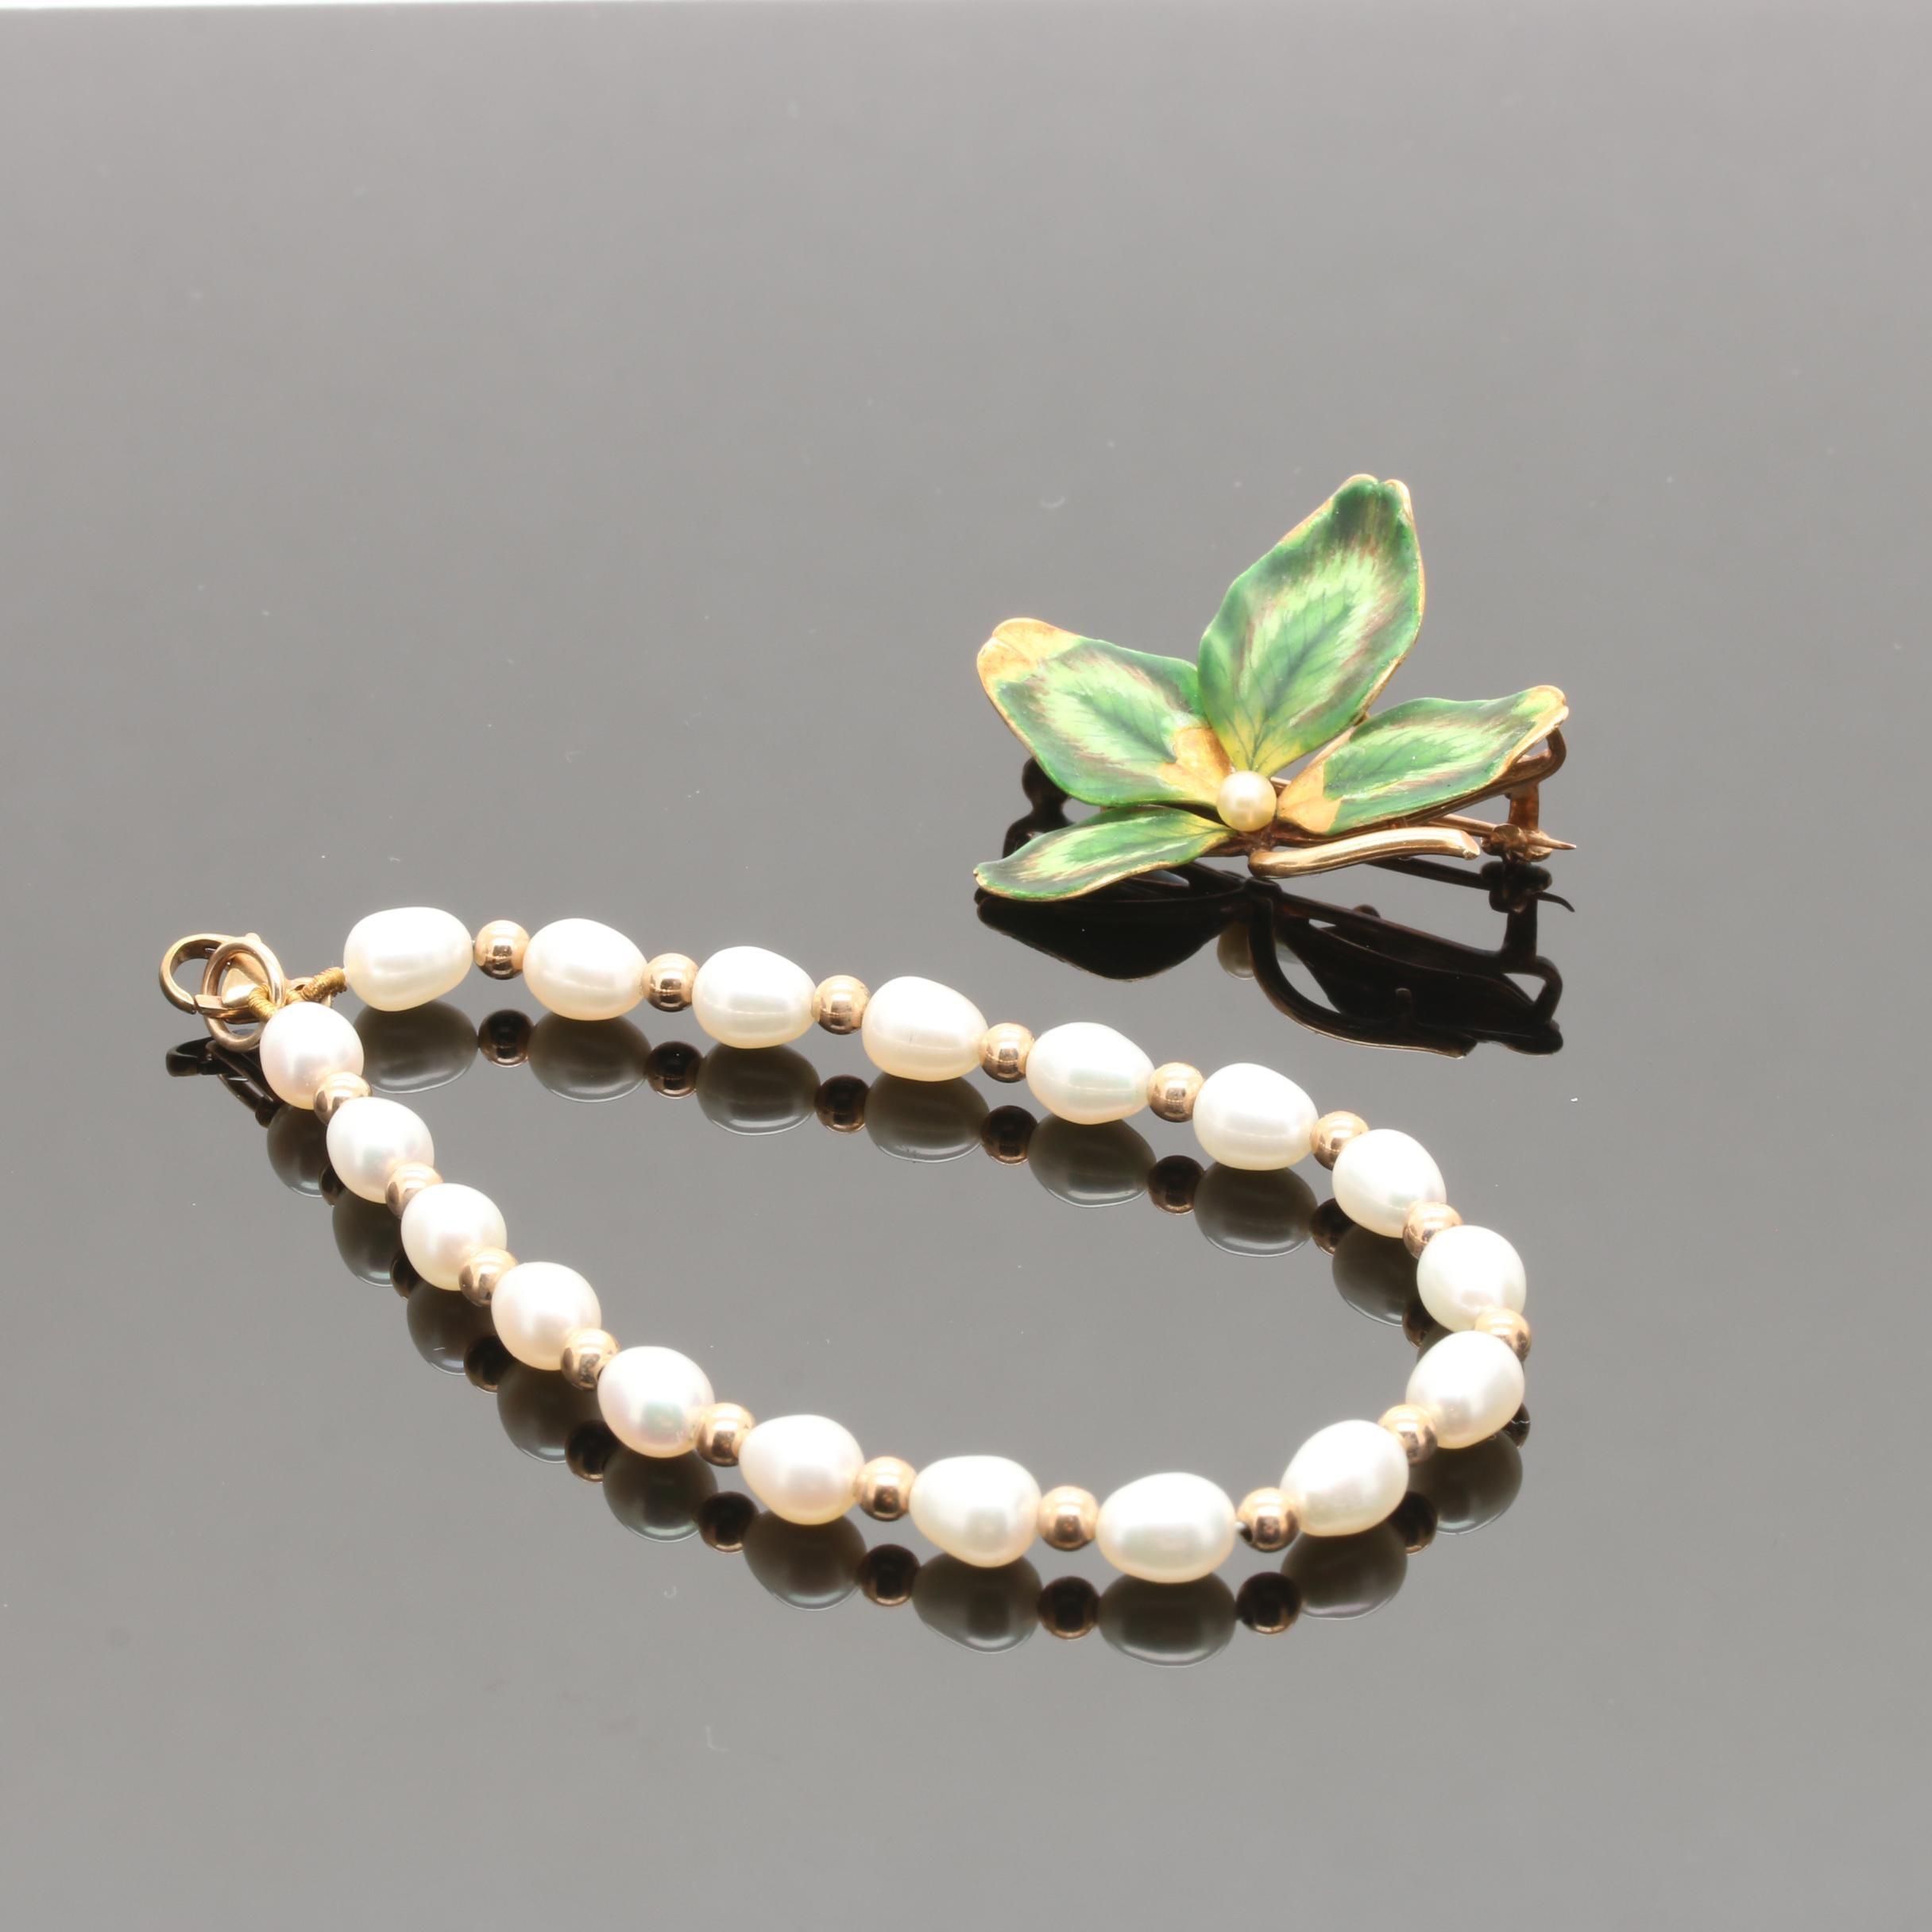 9K Yellow Gold Cultured Pearl Bracelet and 14K Enamel Brooch